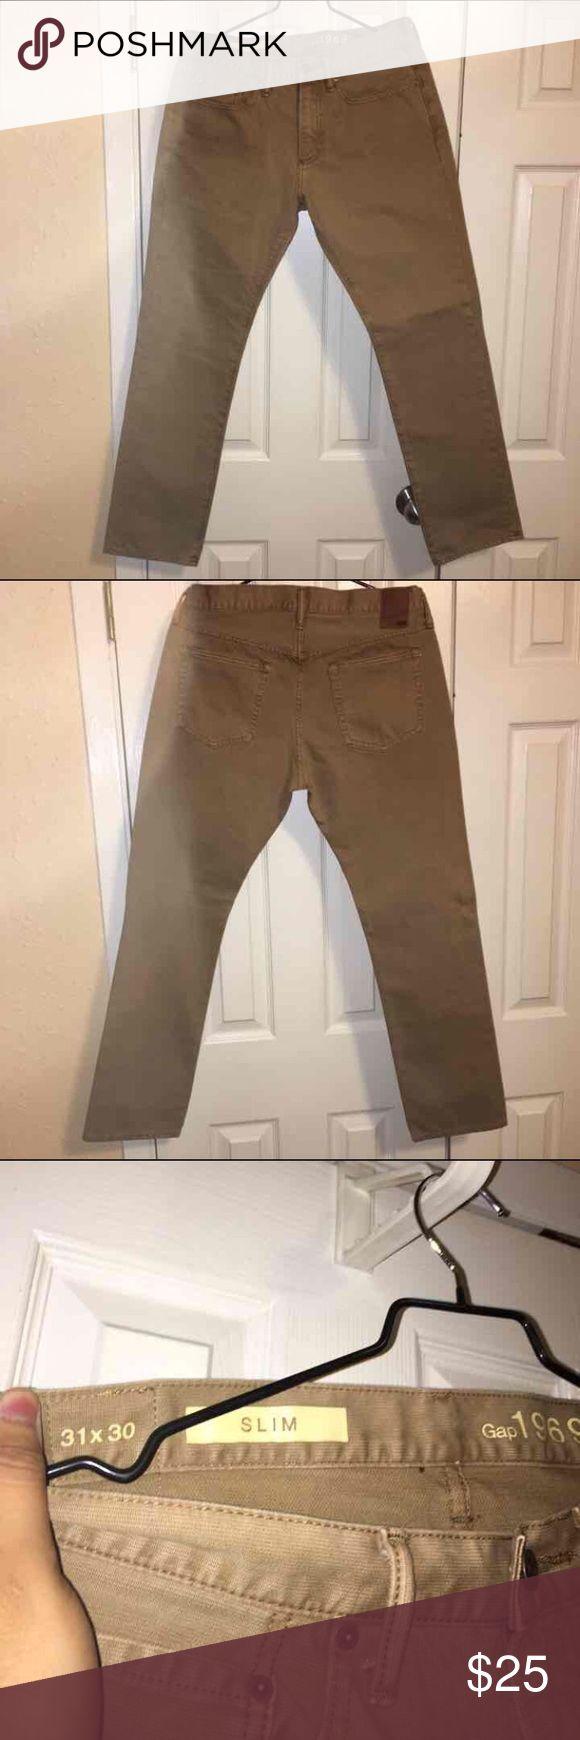 NWOT Gap Slim Fit Khaki Pants 31X30 NWOT High quality, heavyweight material. GAP Pants Chinos & Khakis